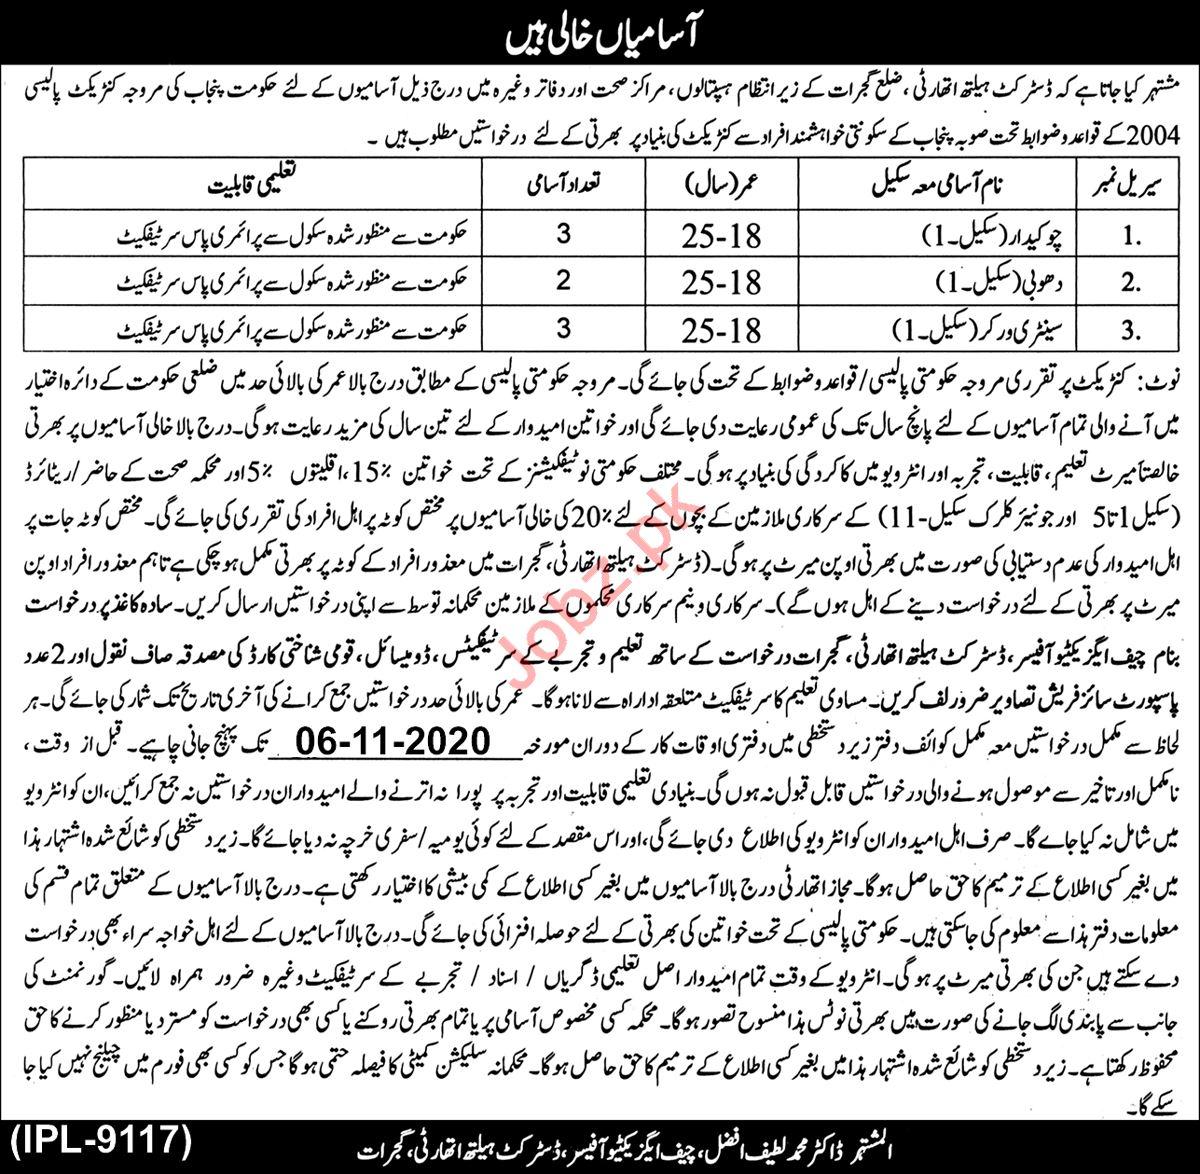 Primary & Secondary Healthcare Department Gujrat Jobs 2020